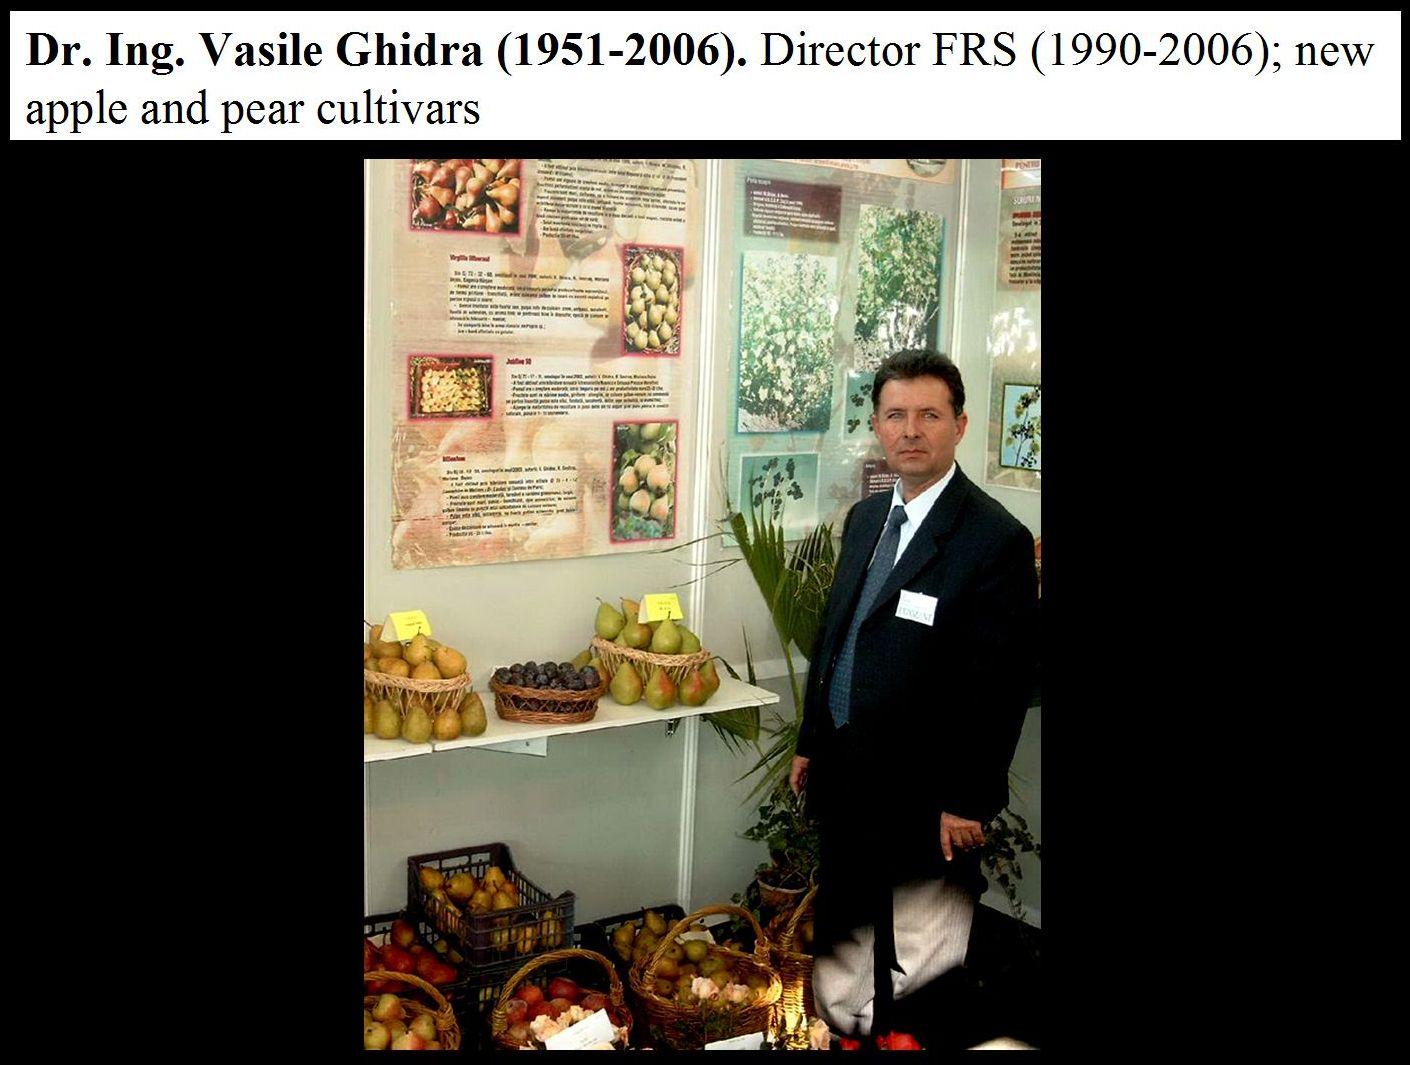 Dr. Vasile Ghidra (1951-2006) - director FRS Cluj